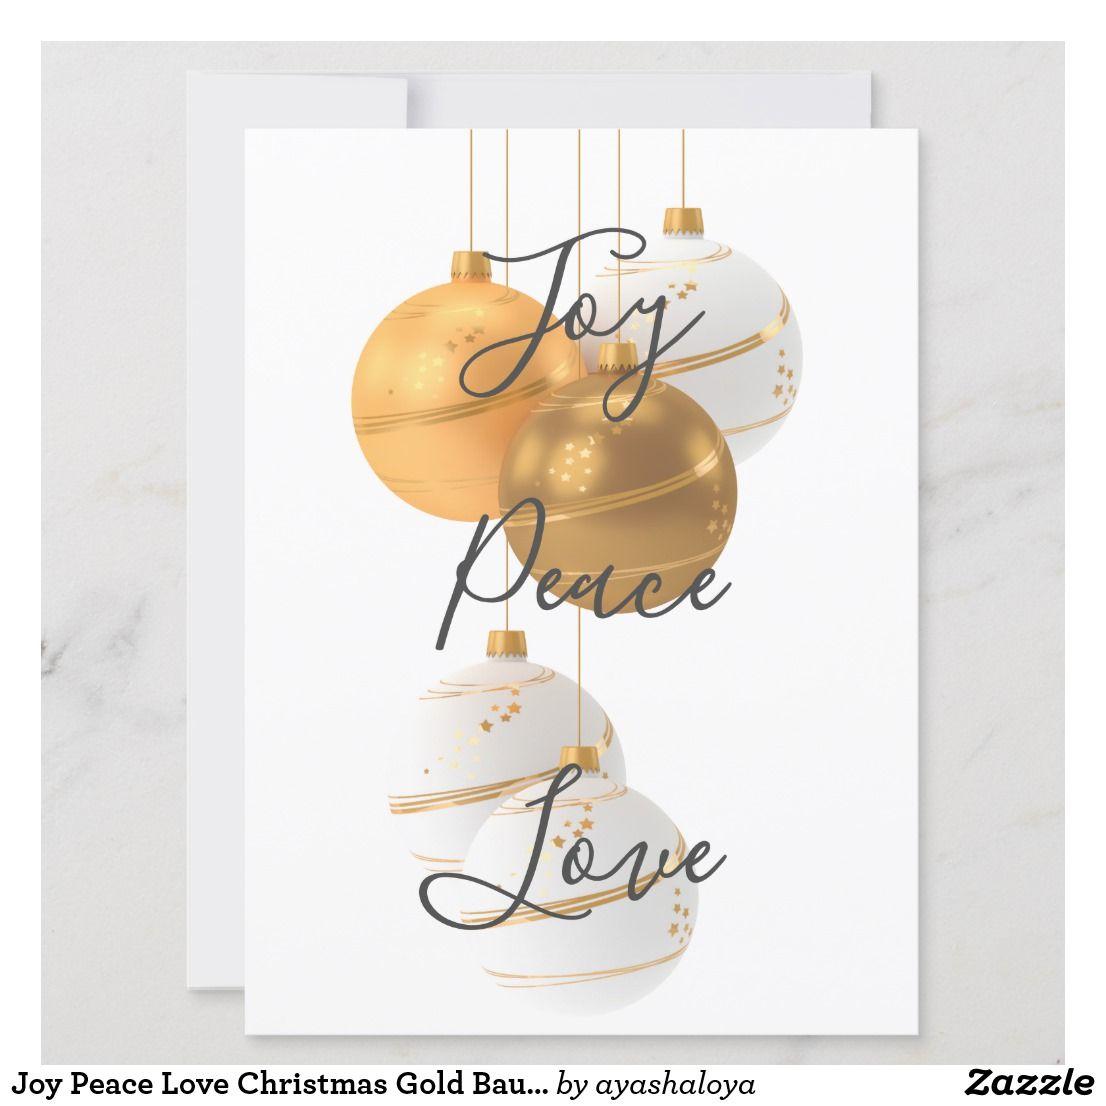 Joy Peace Love Christmas Gold Baubles Holiday Card